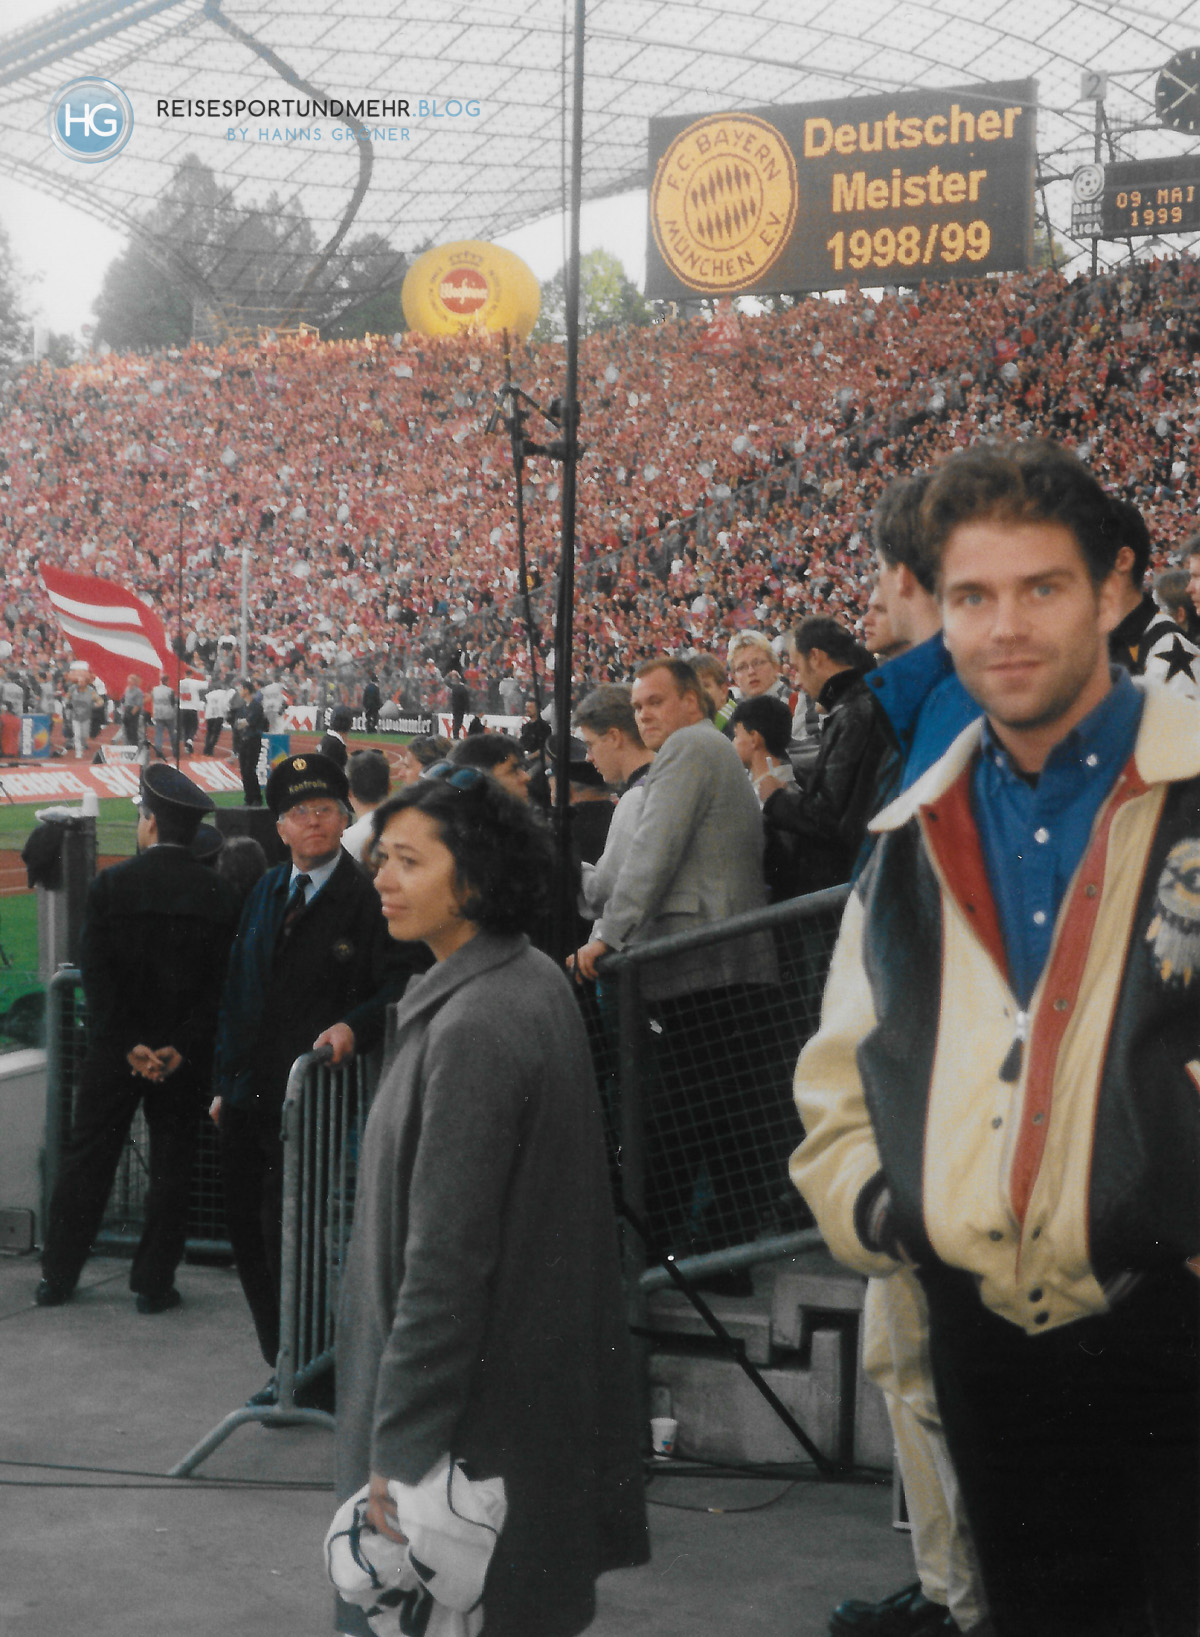 Bayern Meister 1999